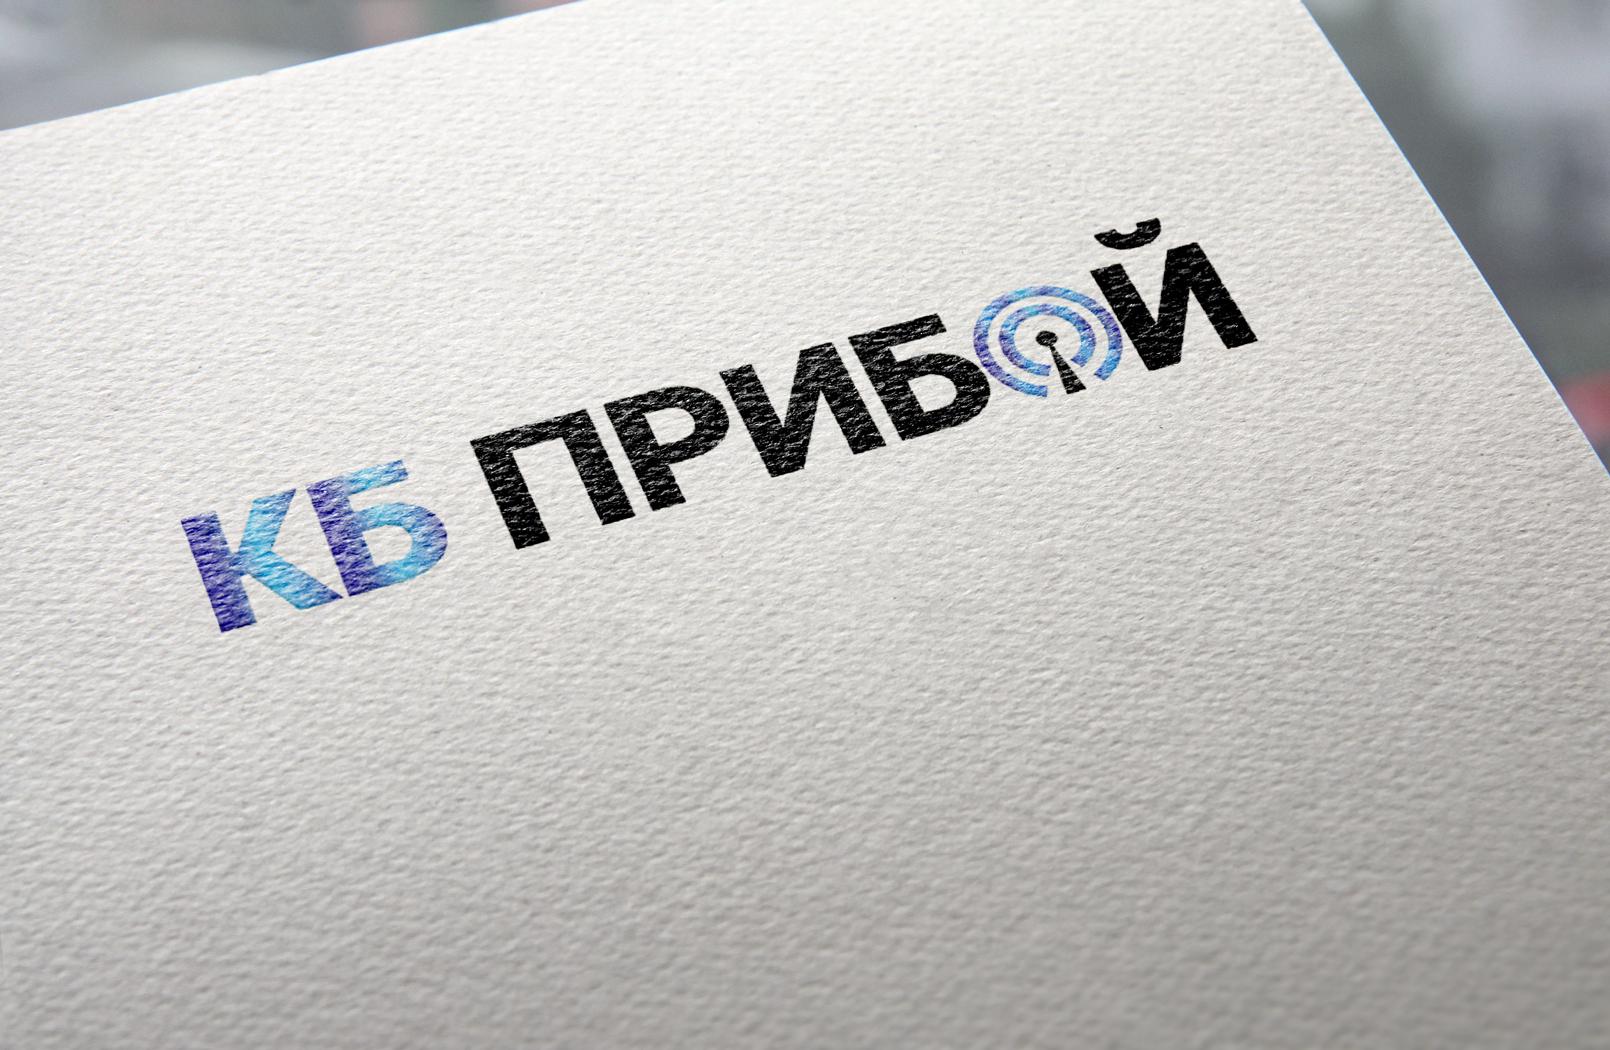 Разработка логотипа и фирменного стиля для КБ Прибой фото f_2215b2b74543bca6.jpg